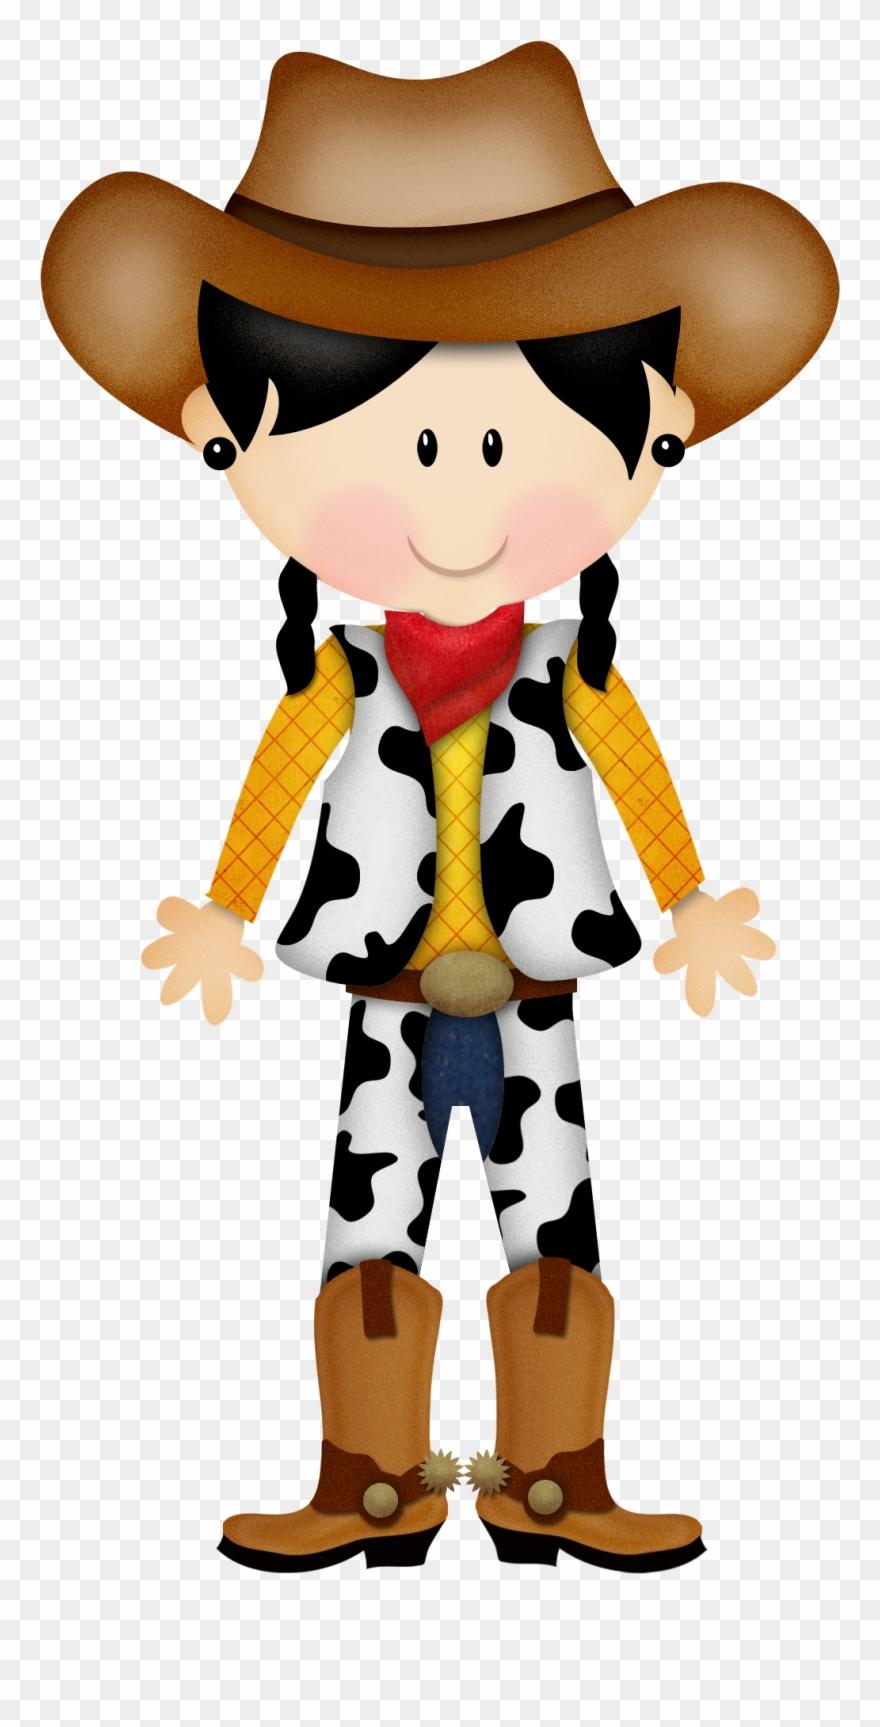 Cowgirl clipart cowgirl texas. Ropa de woody dibujo